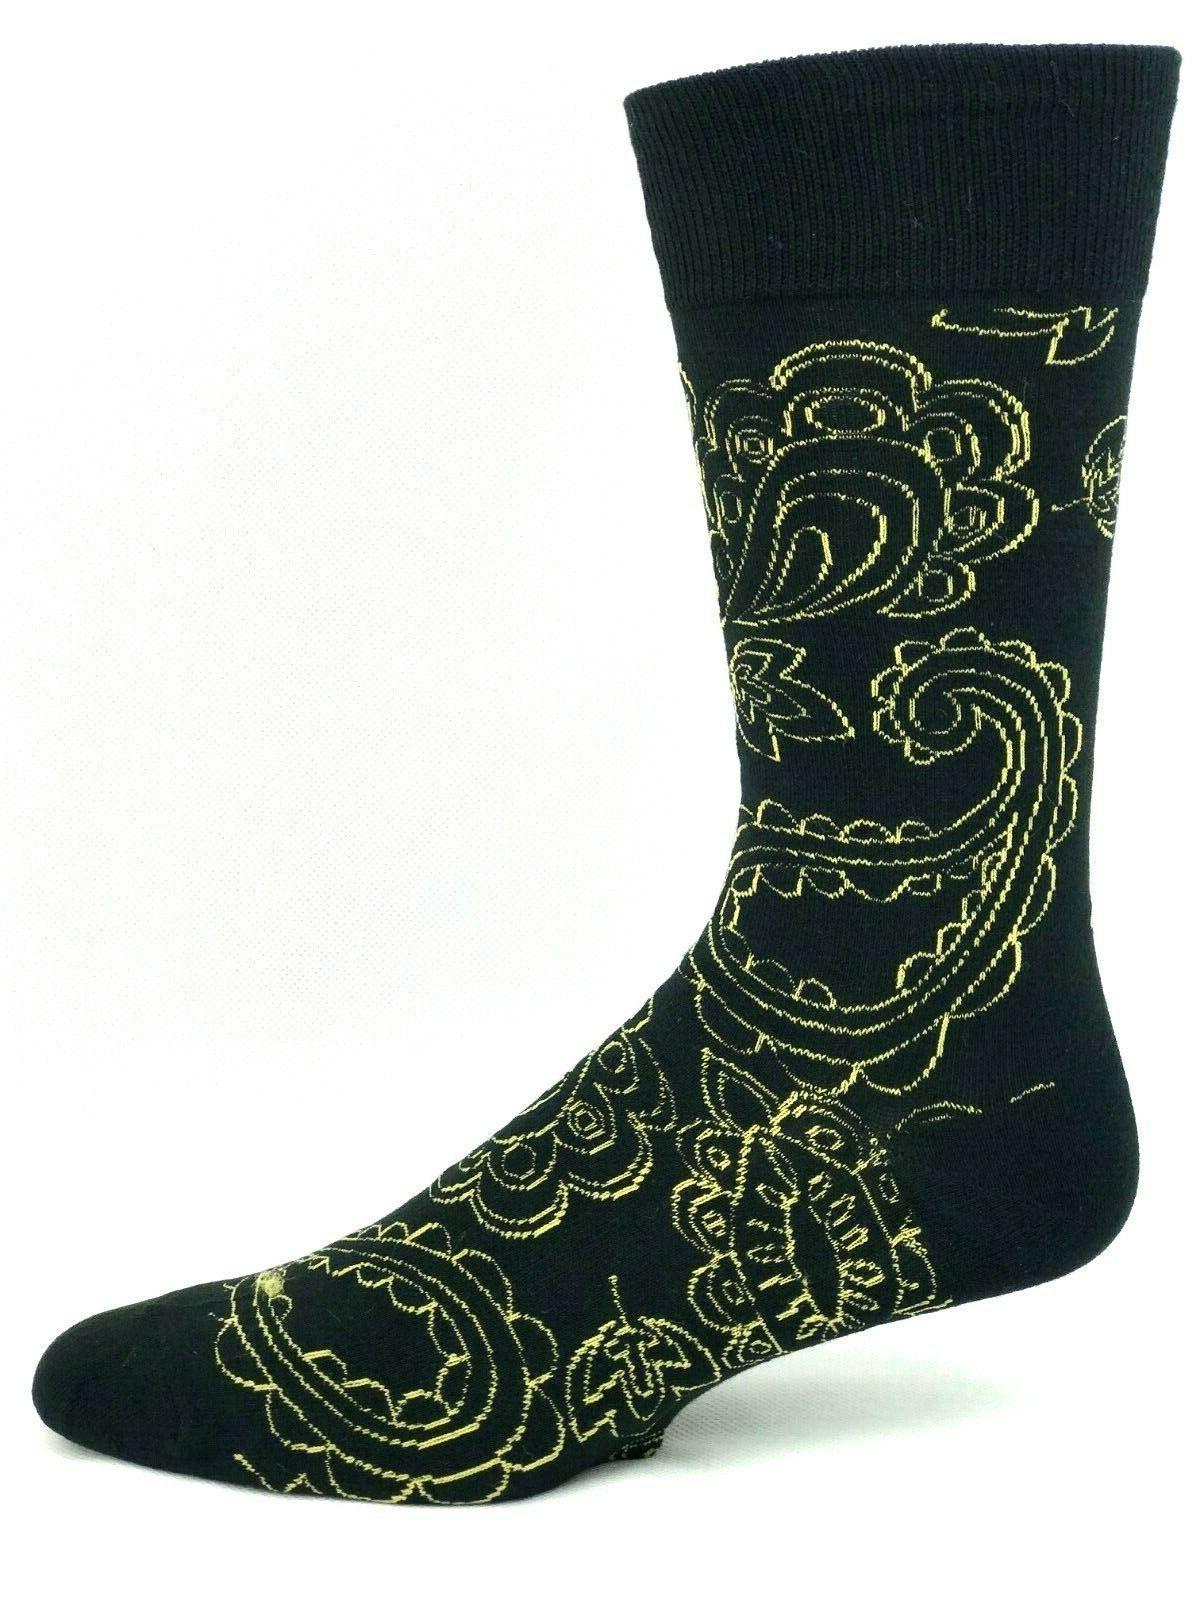 Yo and Gold Pattern Crew Dress Socks